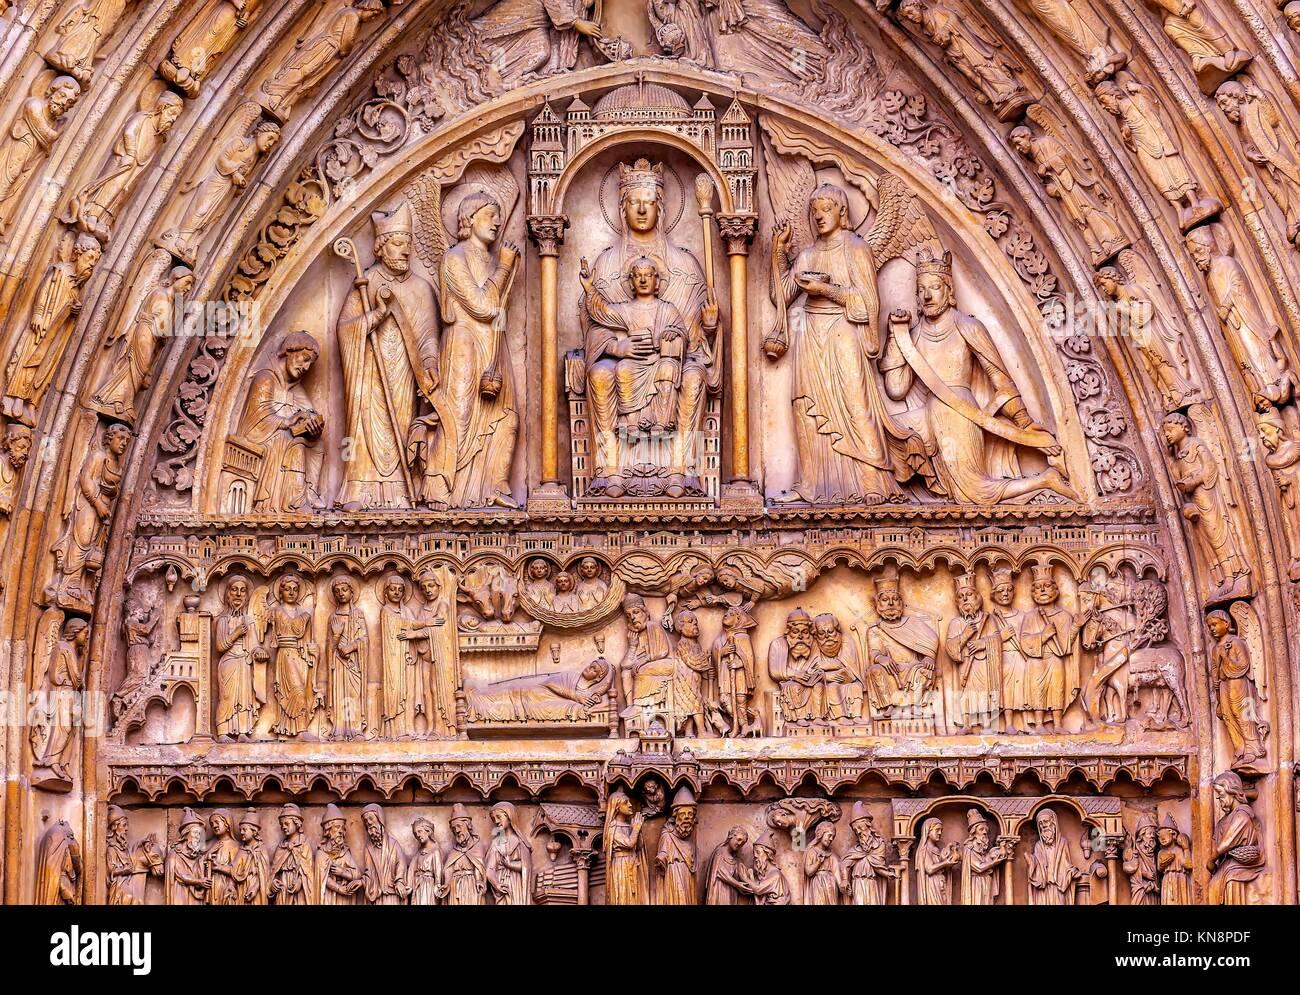 Saint Anne Door Biblical Statues Virgin Mary Baby Jesus Bishop Angels Notre Dame Cathedral Paris France. Notre Dame Stock Photo